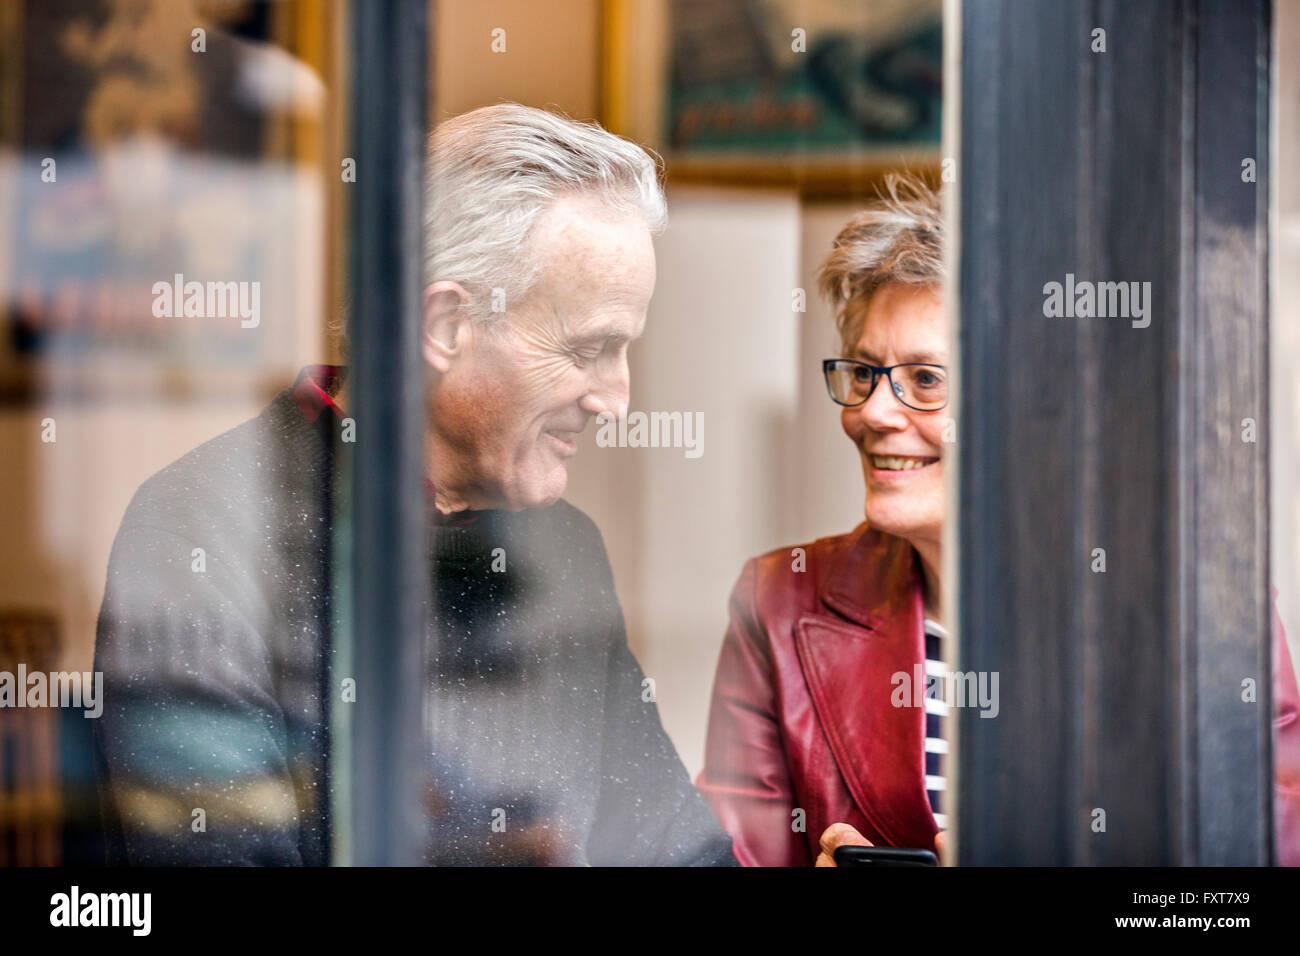 Senior couple sitting at cafe window seat chatting - Stock Image